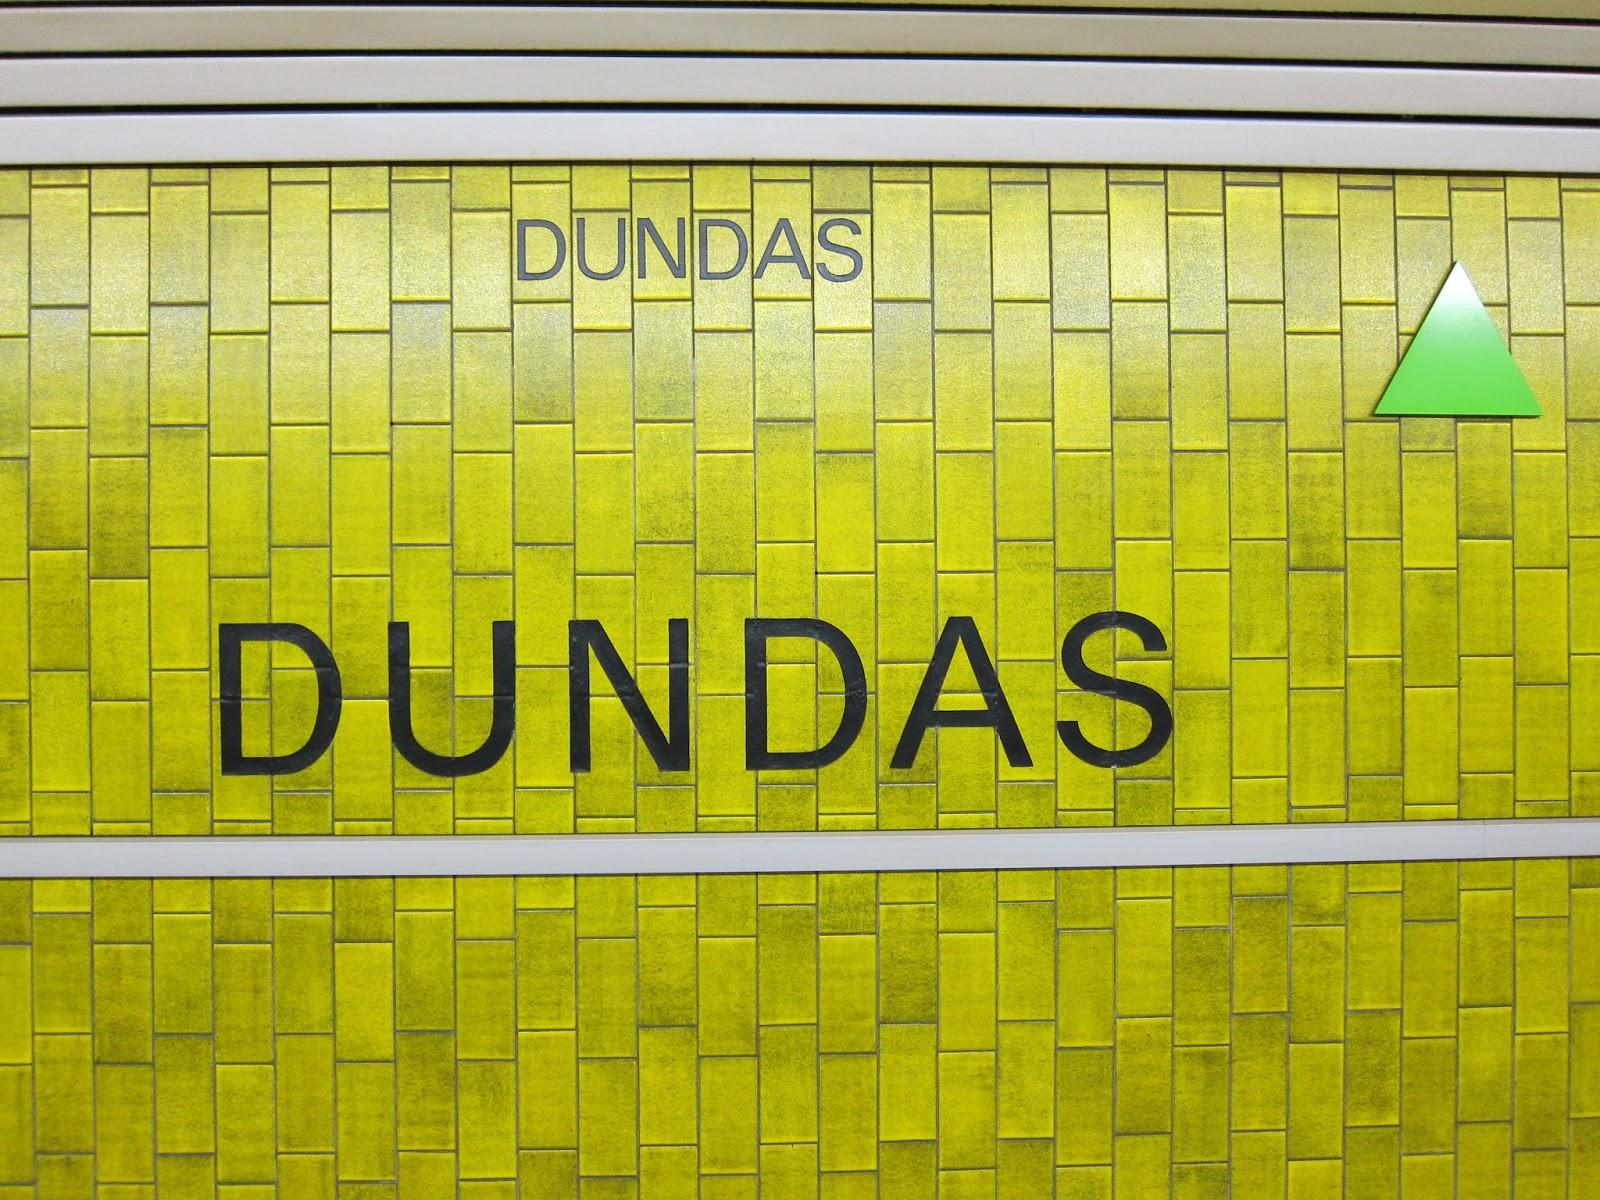 Dundas station tiling